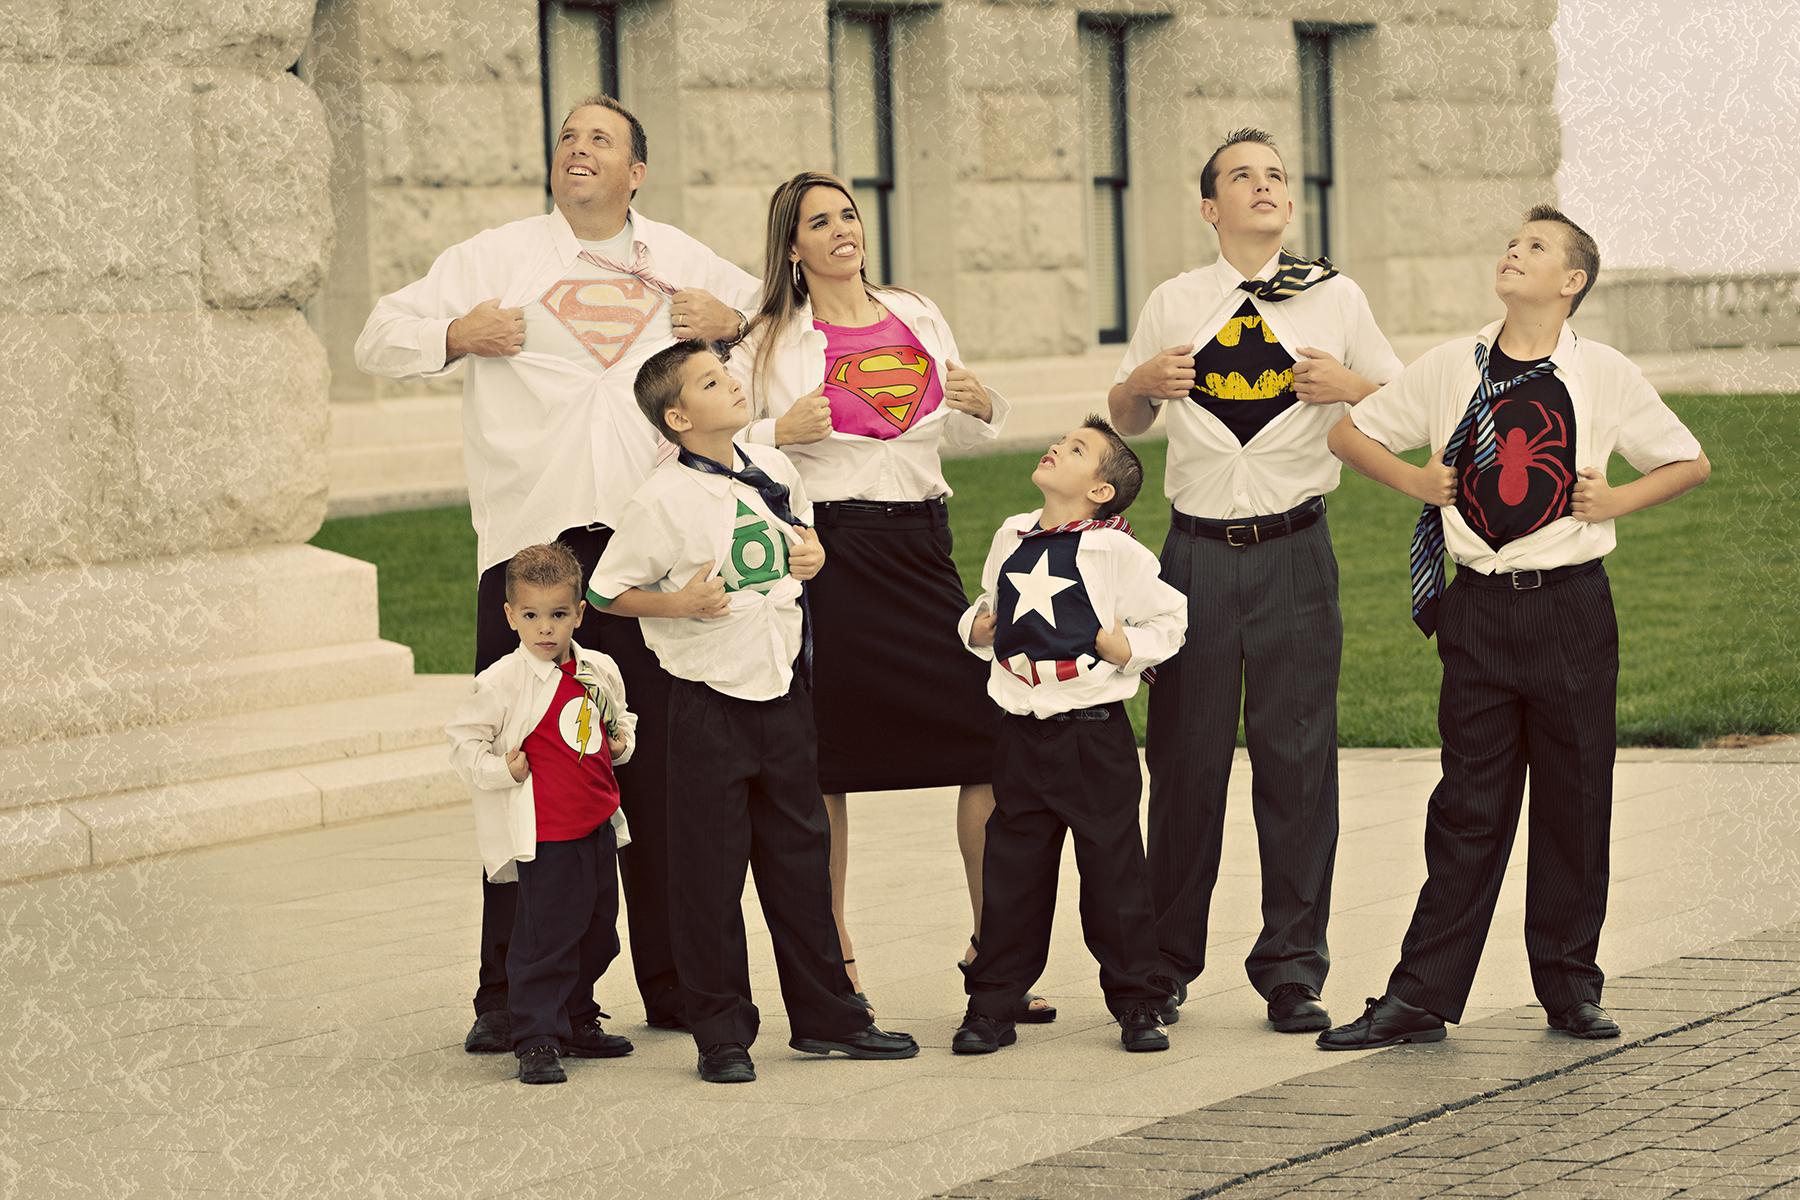 Utah Superhero Family Photos awesome fun